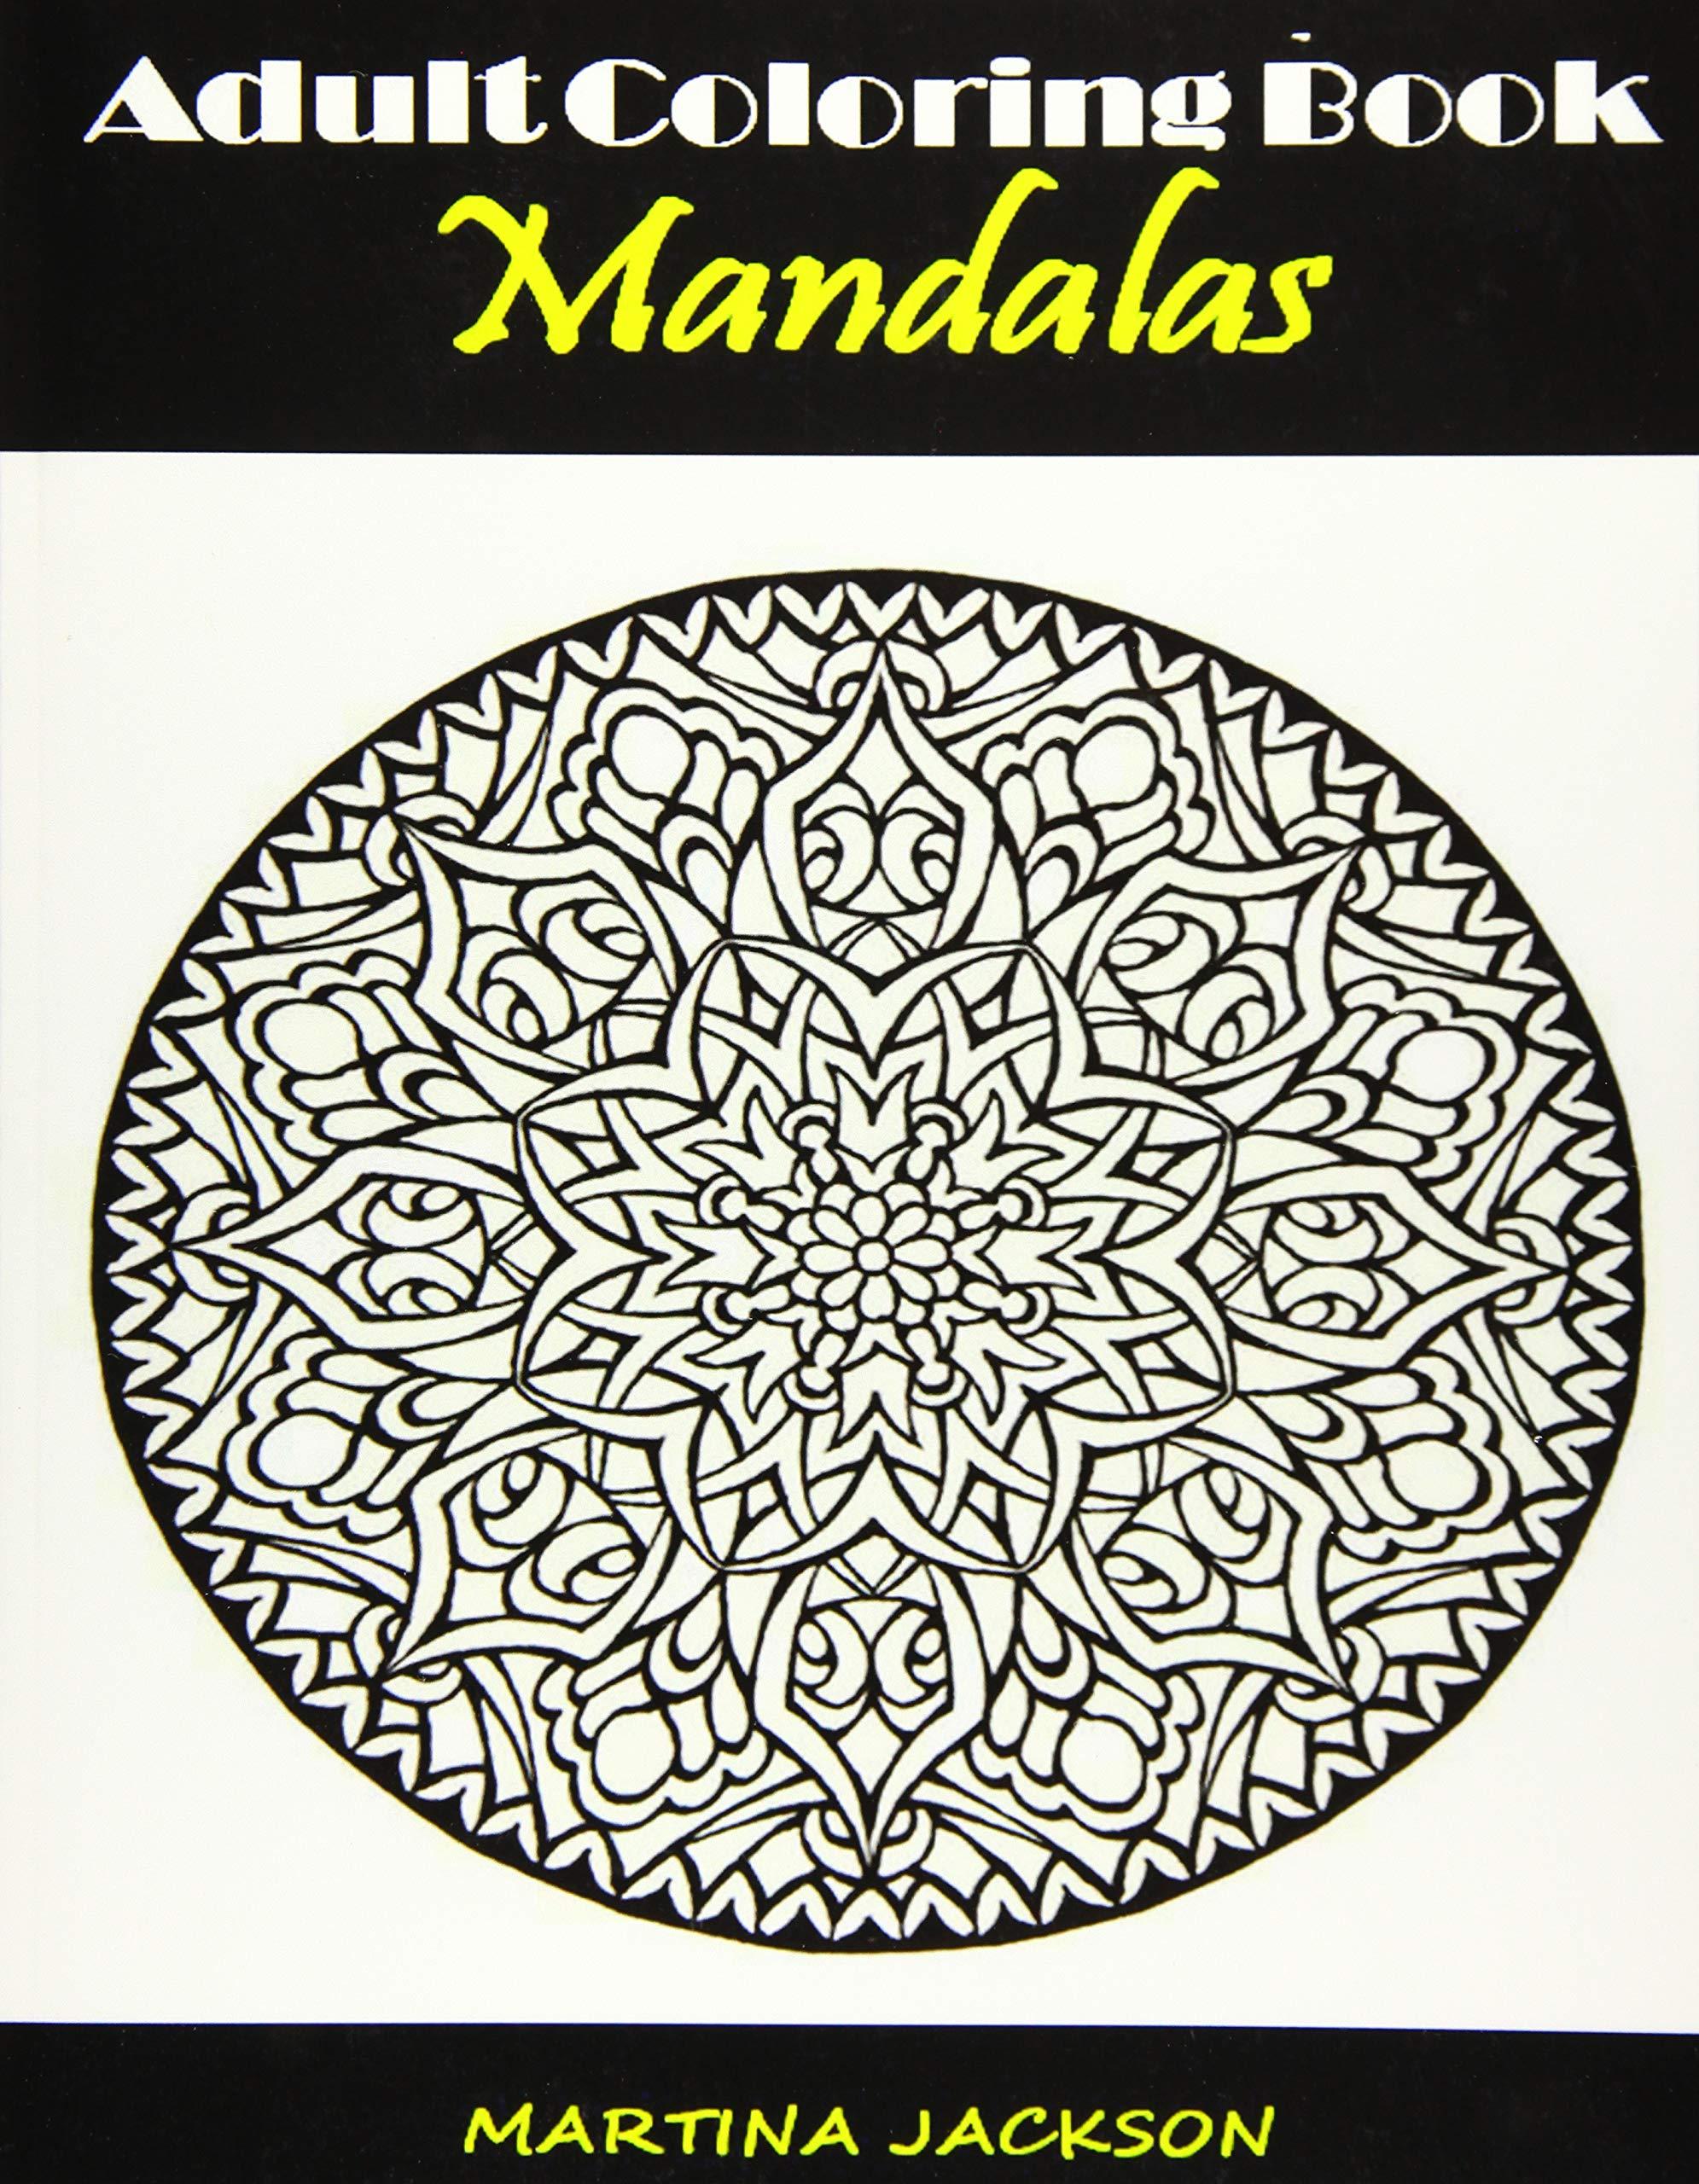 - Amazon.com: Adult Coloring Book Mandalas: 40 Detailed Coloring